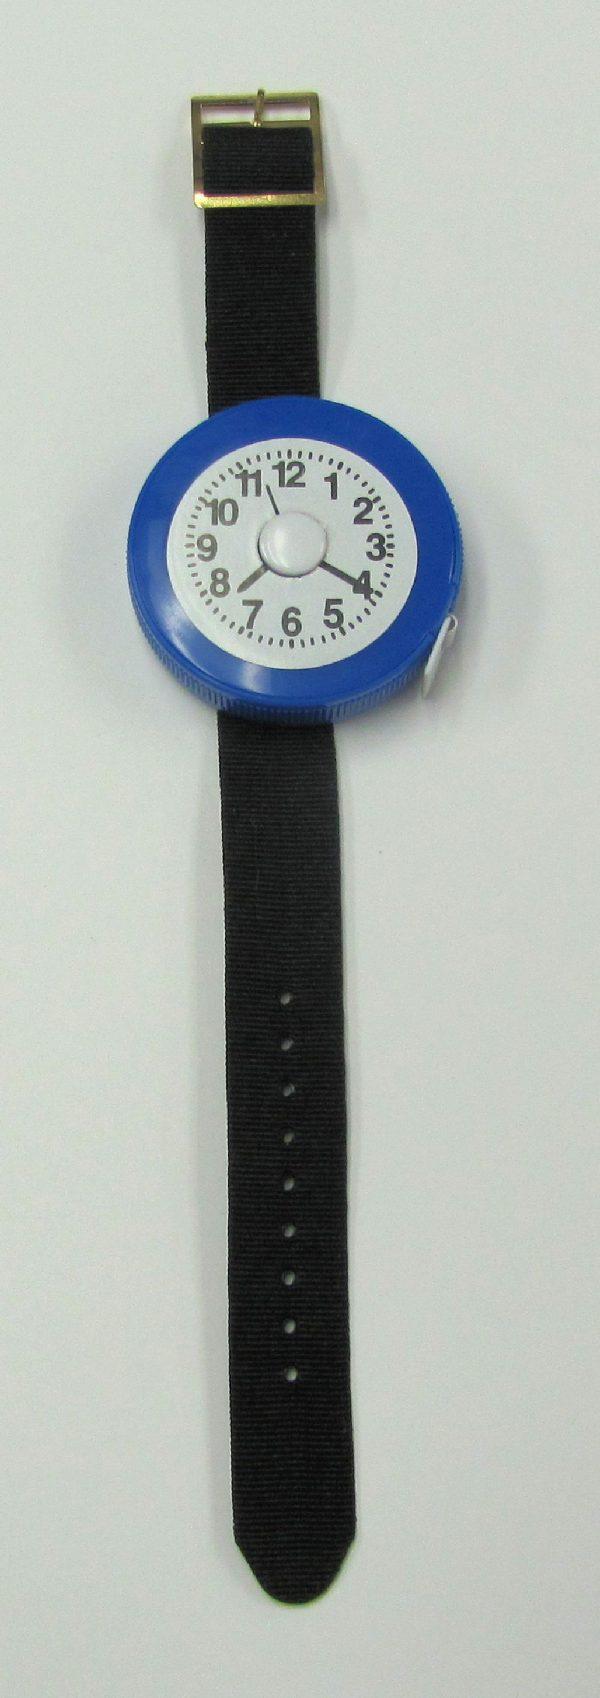 Comedy Tape Measure Watch